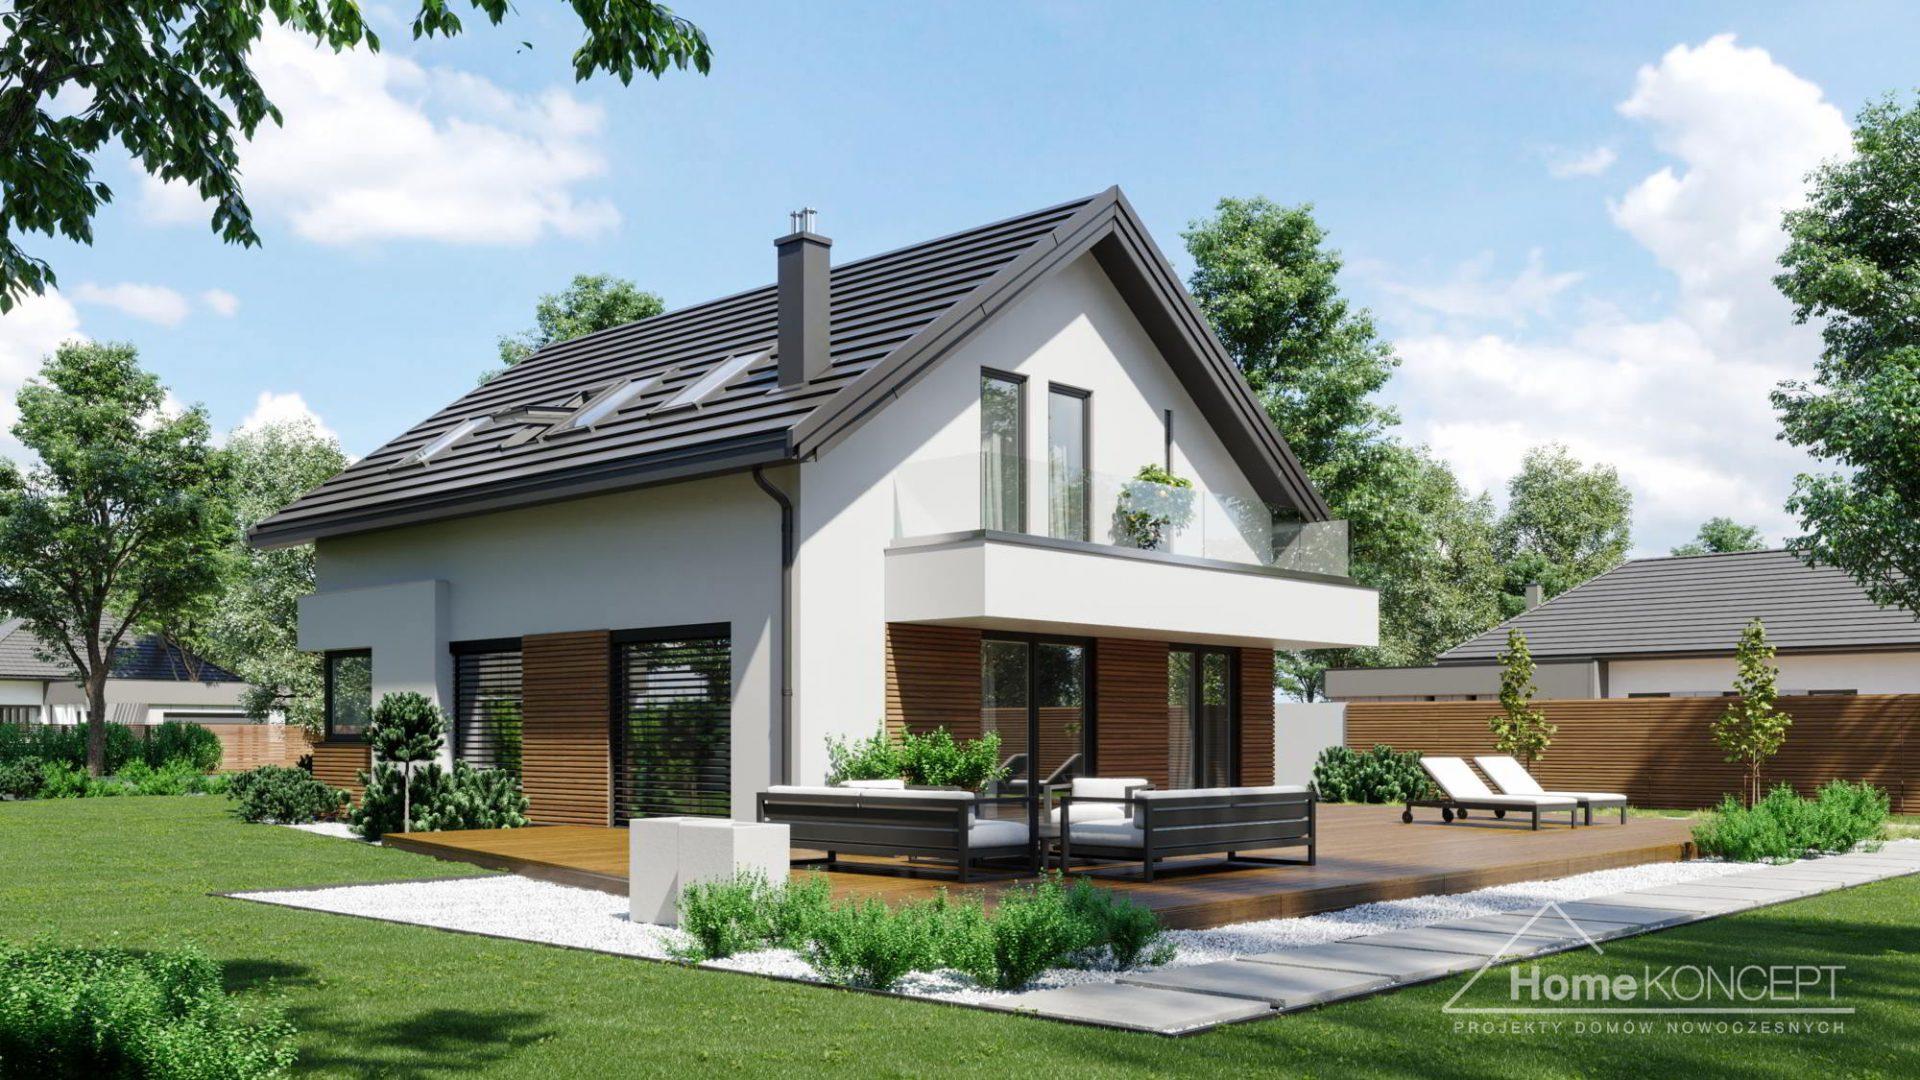 HomeKONCEPT 72 projekt domu energooszcczędnego